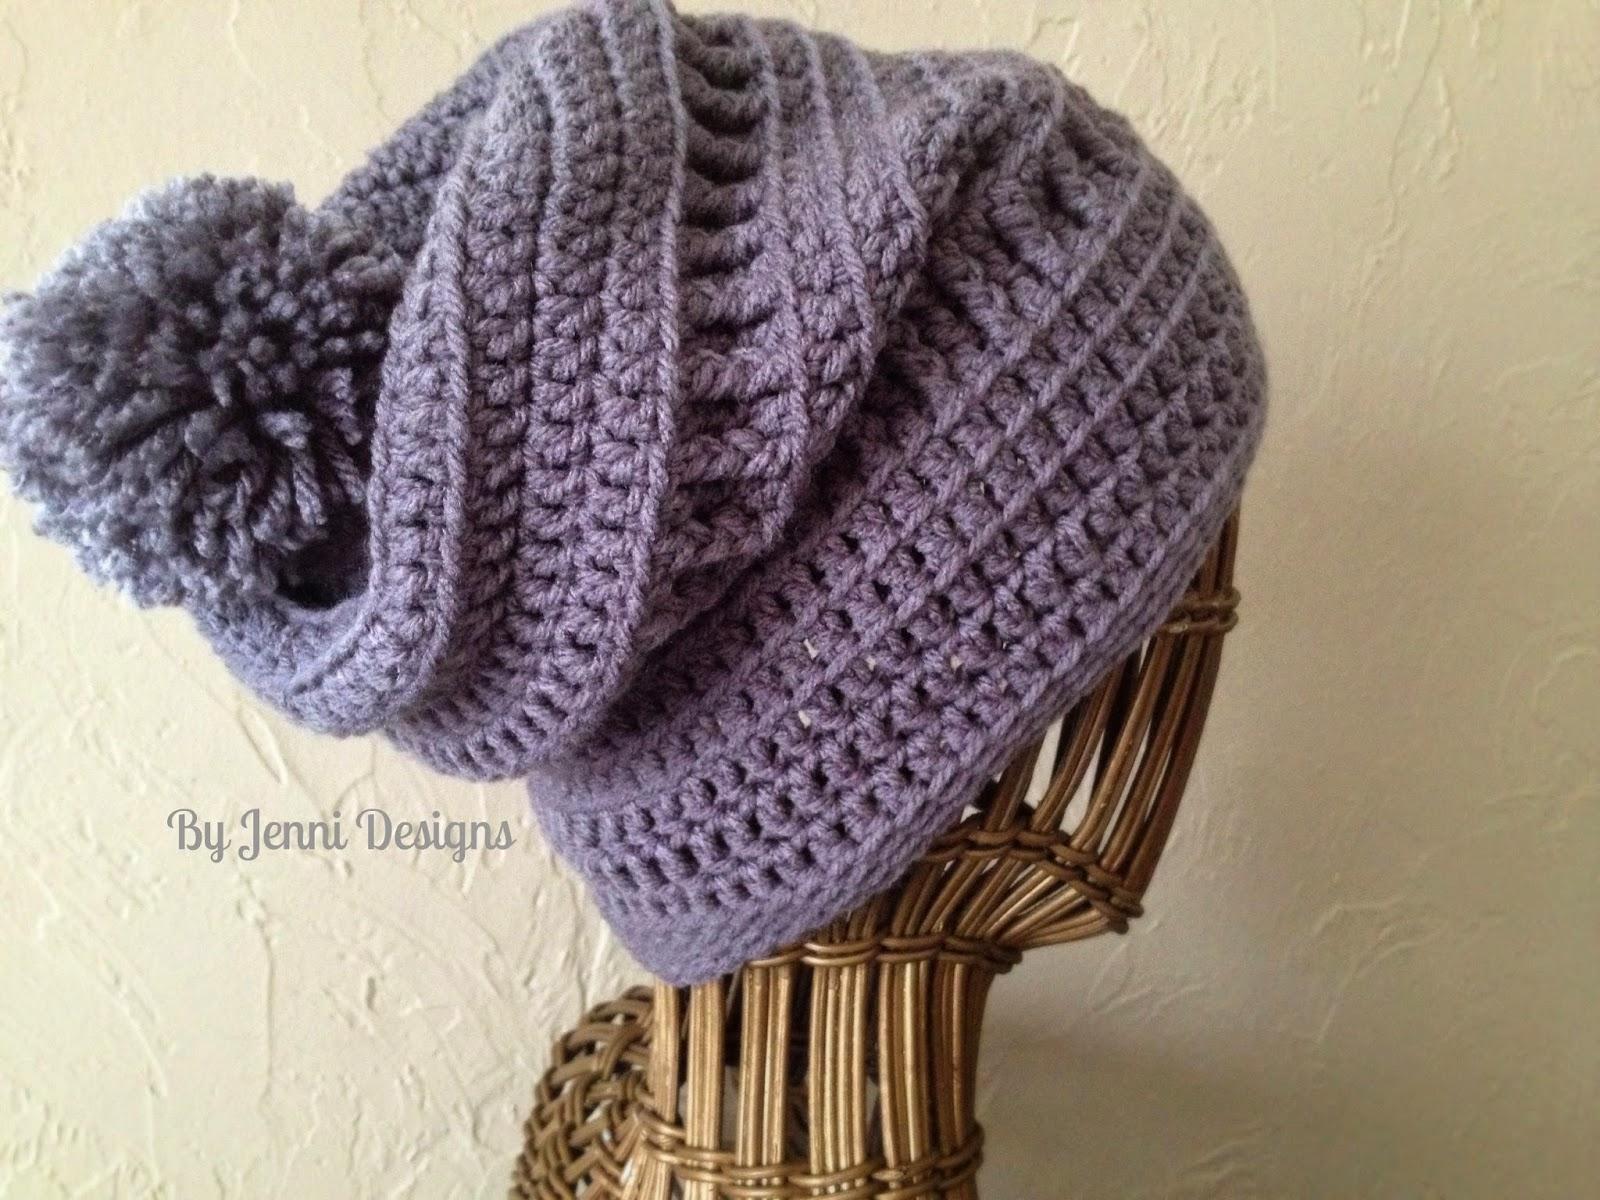 By Jenni Designs Free Crochet Pattern Women S Slouchy Textured Beanie